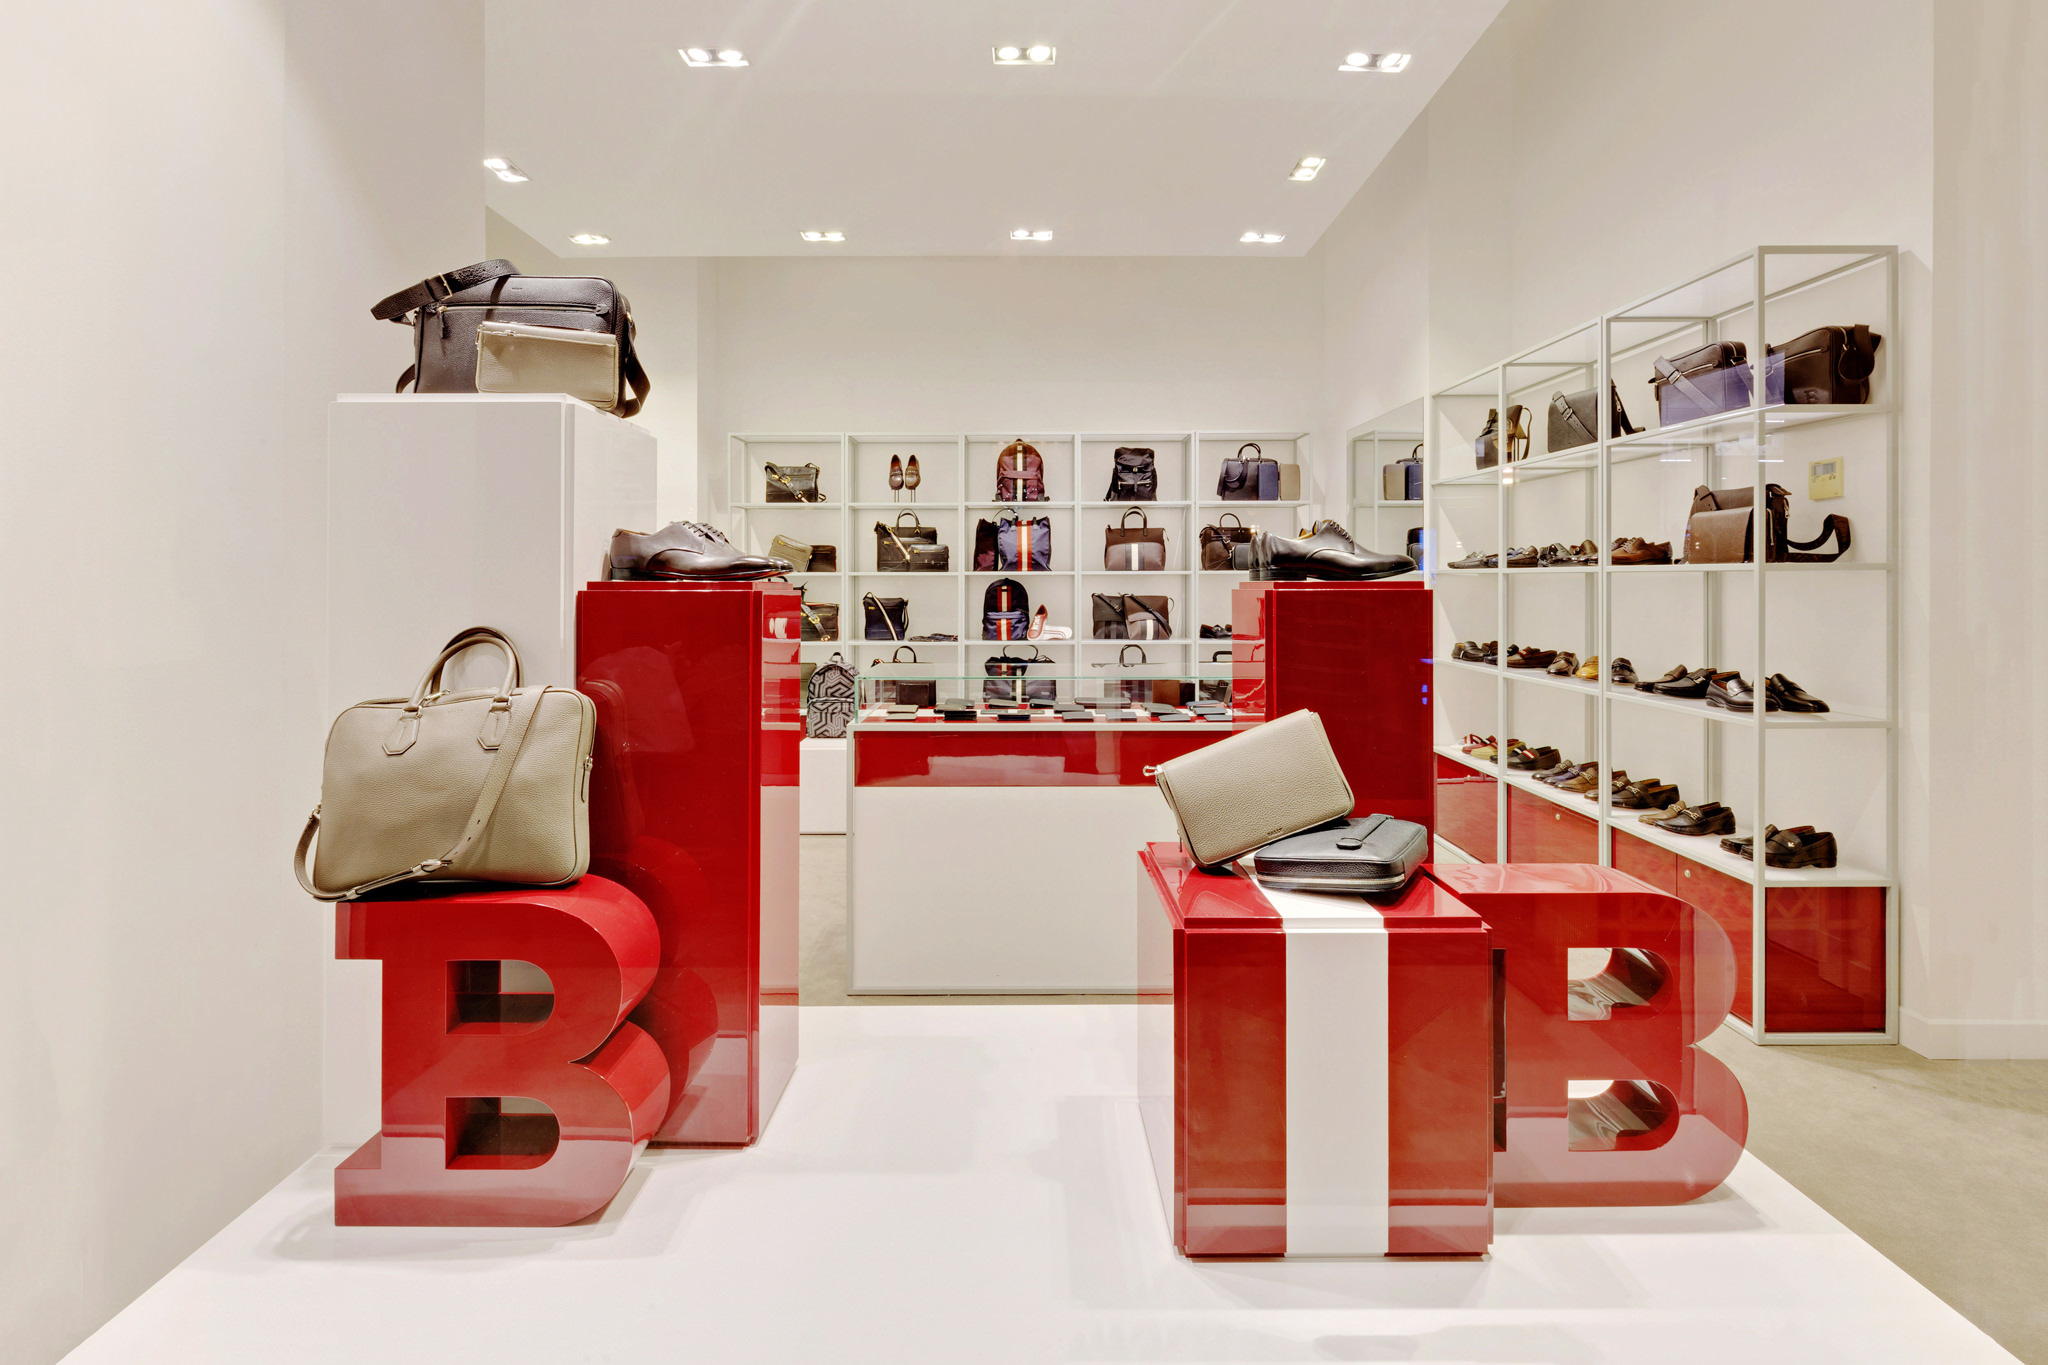 20170316 - Bally - HCM - Commercial - Interior - Store - Retouch 0004.jpg